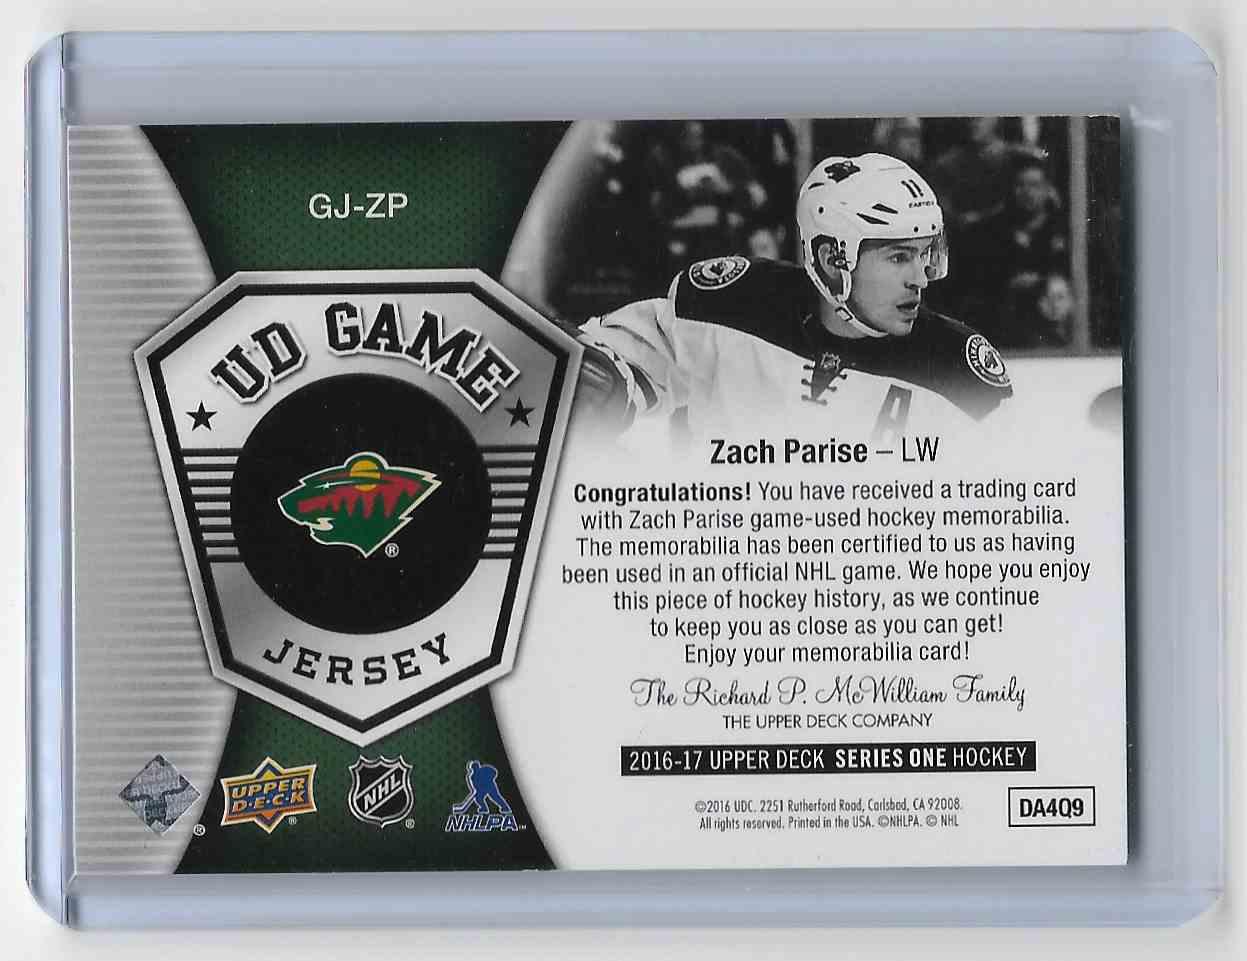 2016-17 Upper Deck Zach Parise #GJ-ZP card back image